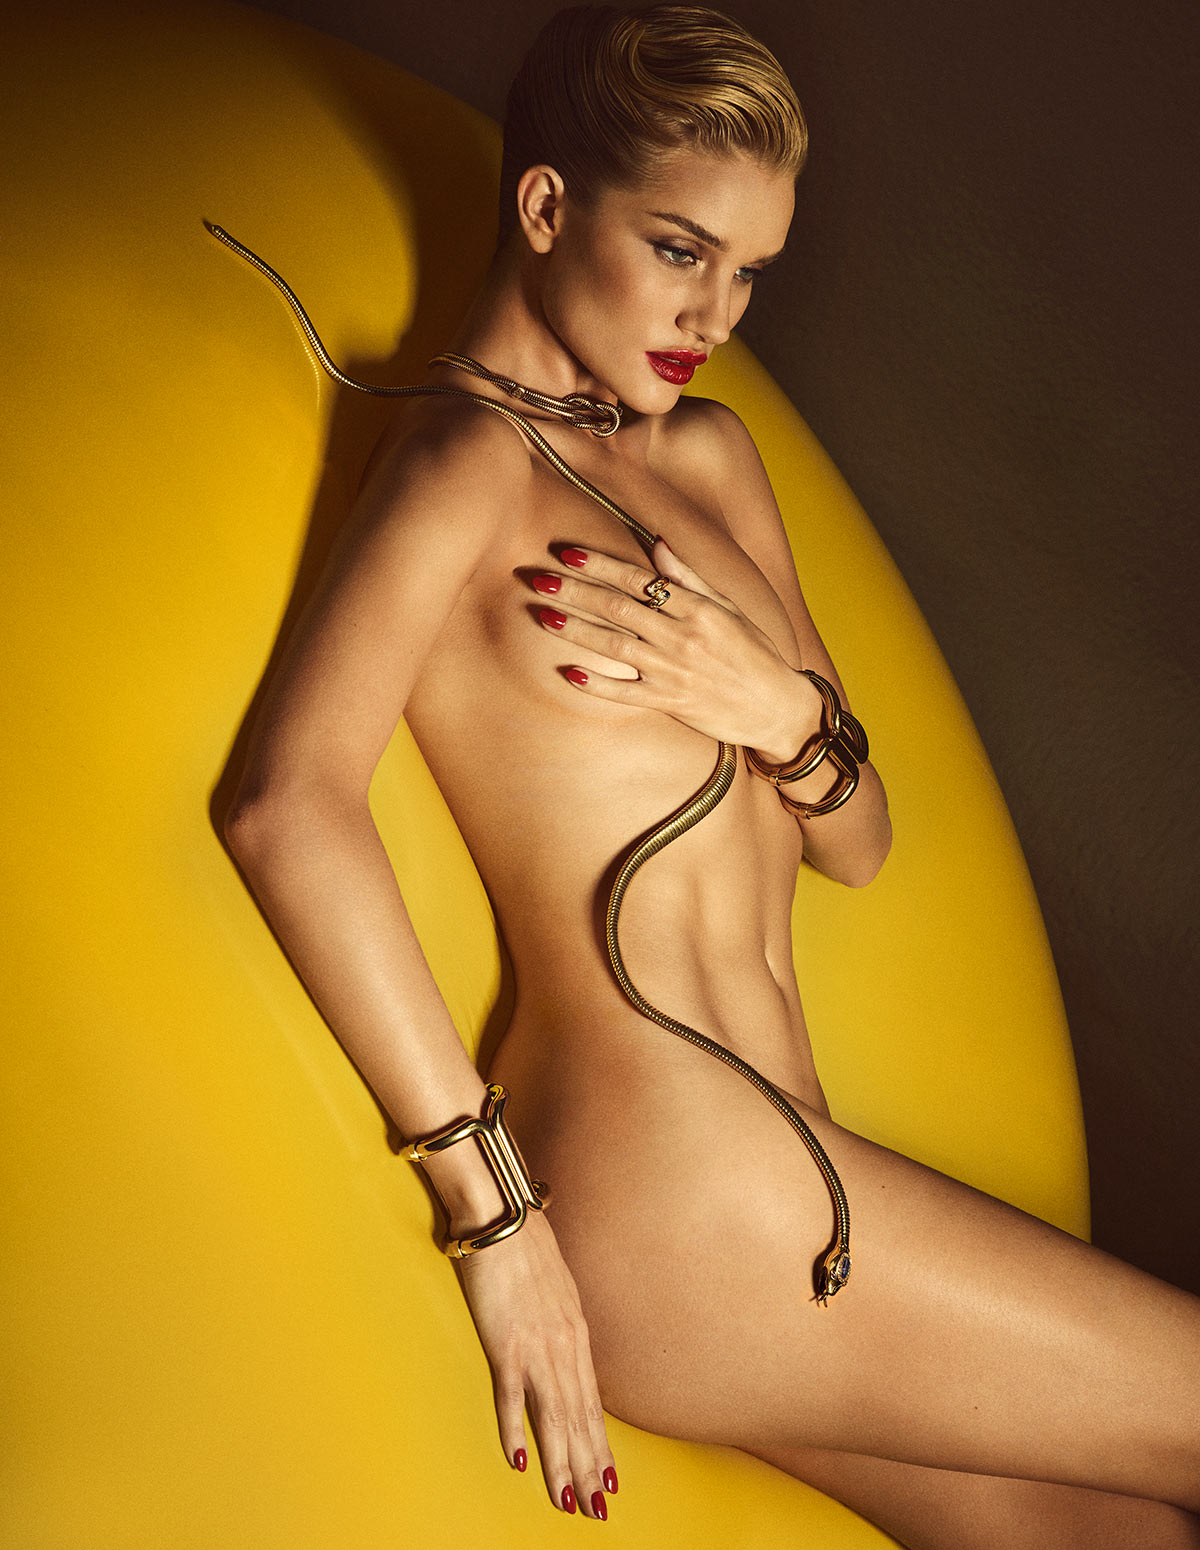 Huntington-Whiteley sexy trên tạp chí Lui